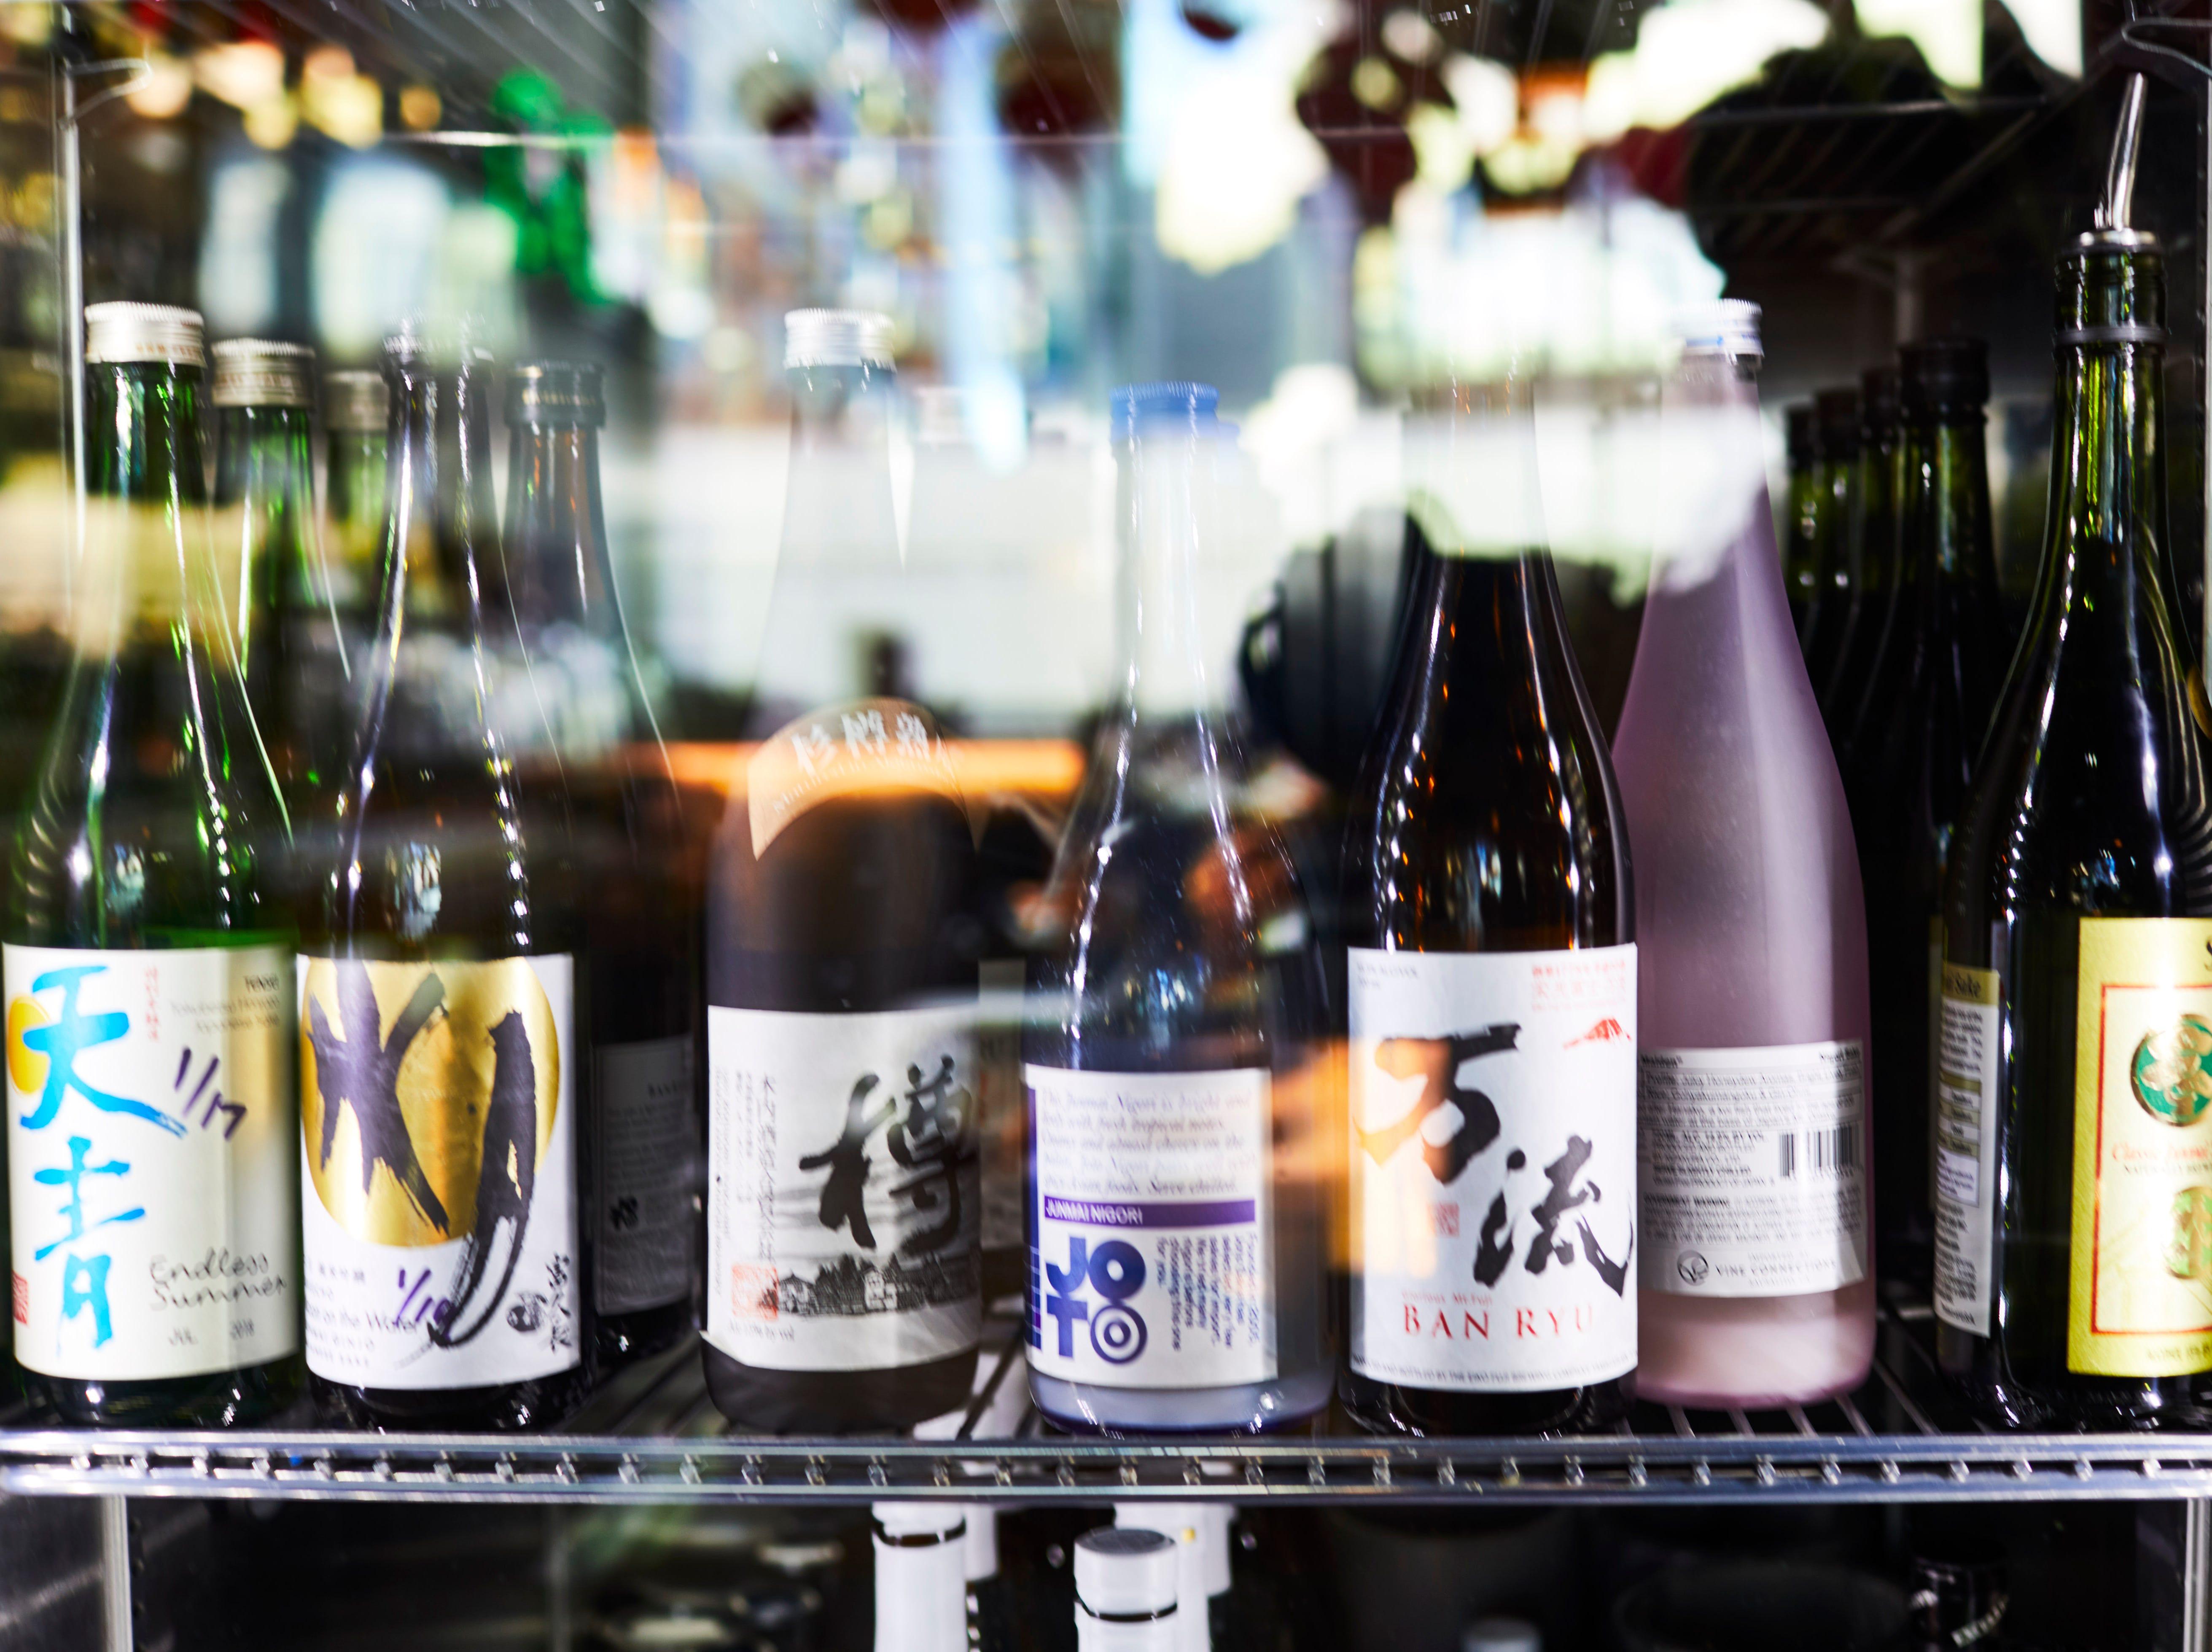 A selection of sakes at Bar Otaku.